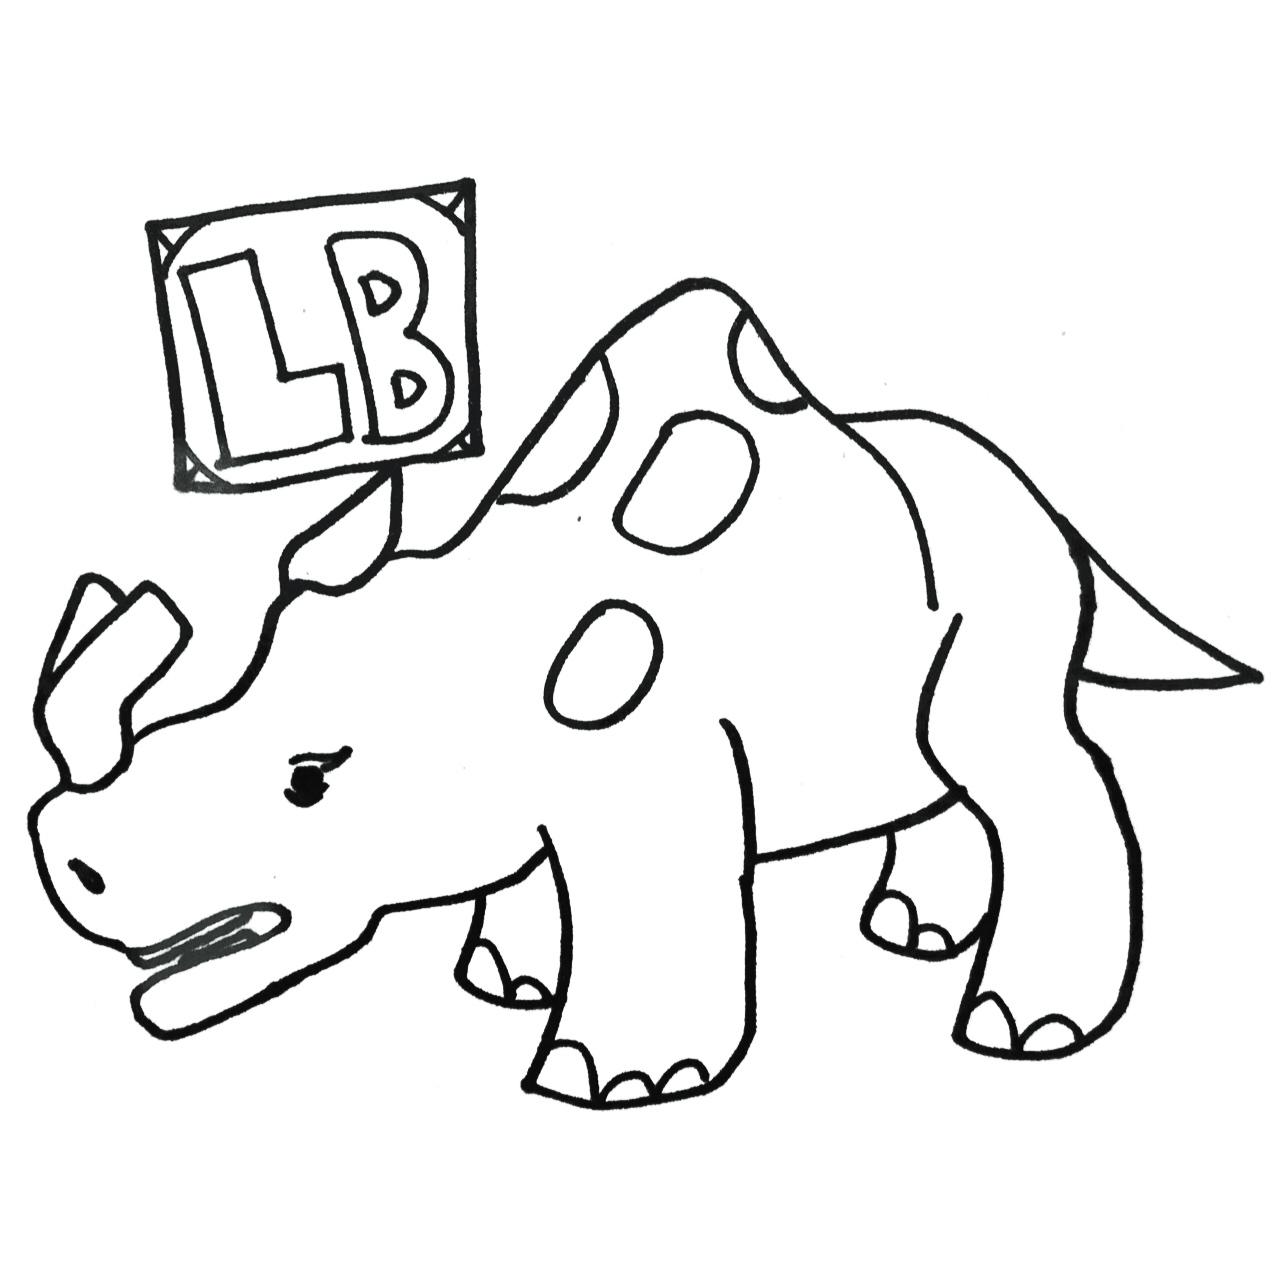 LB Ep 189 artwork